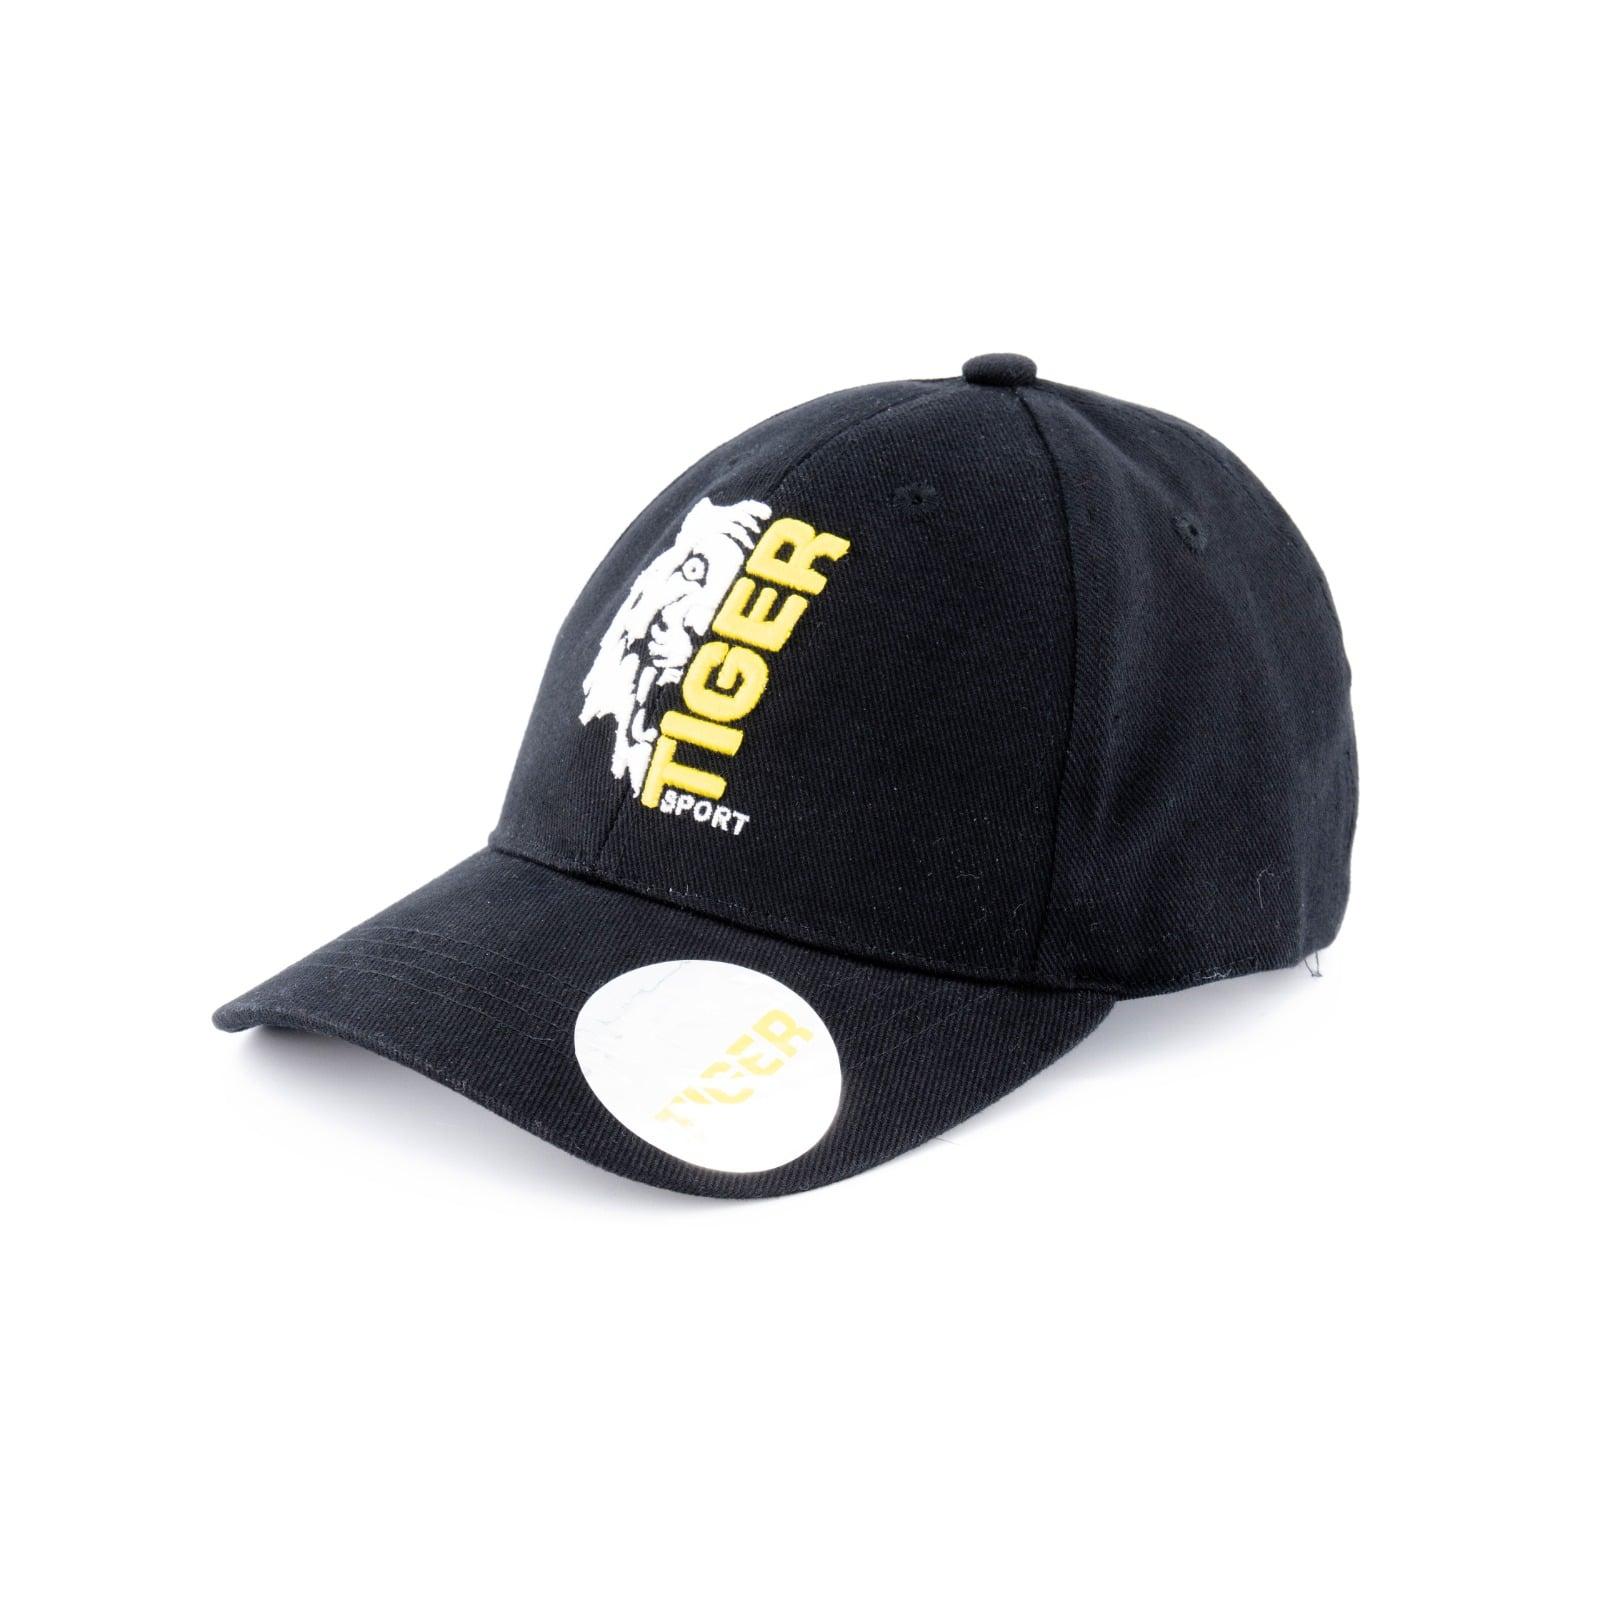 TIGER CAP| כובע פרימיום ONE SIZE צבע שחור